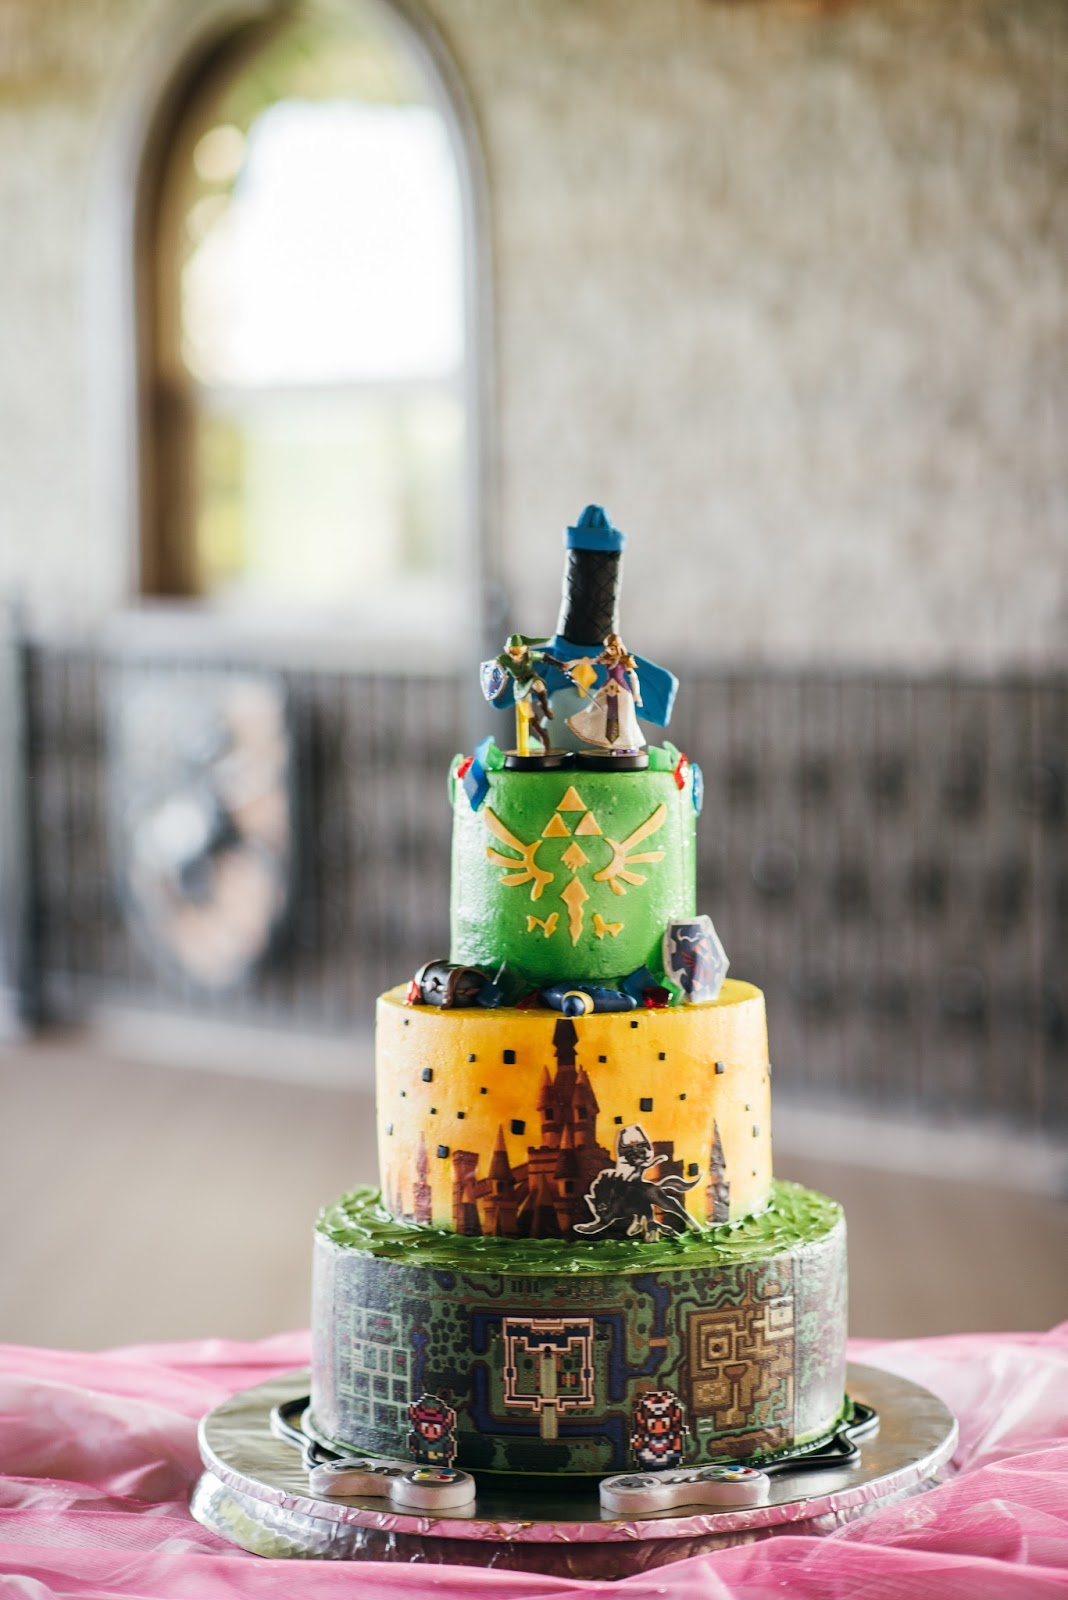 The Animated Anajo The Cake